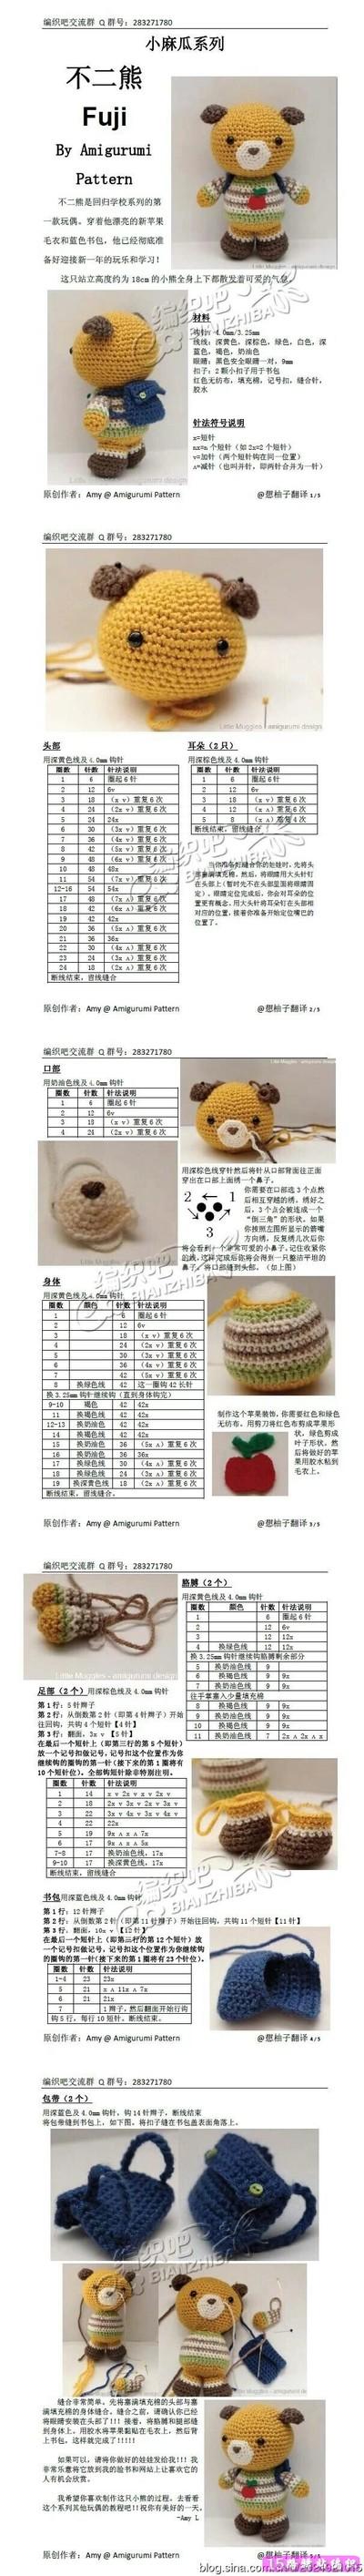 堆糖-美好生活研究所 | amigurumis | Pinterest | Patrones, Amigurumi ...